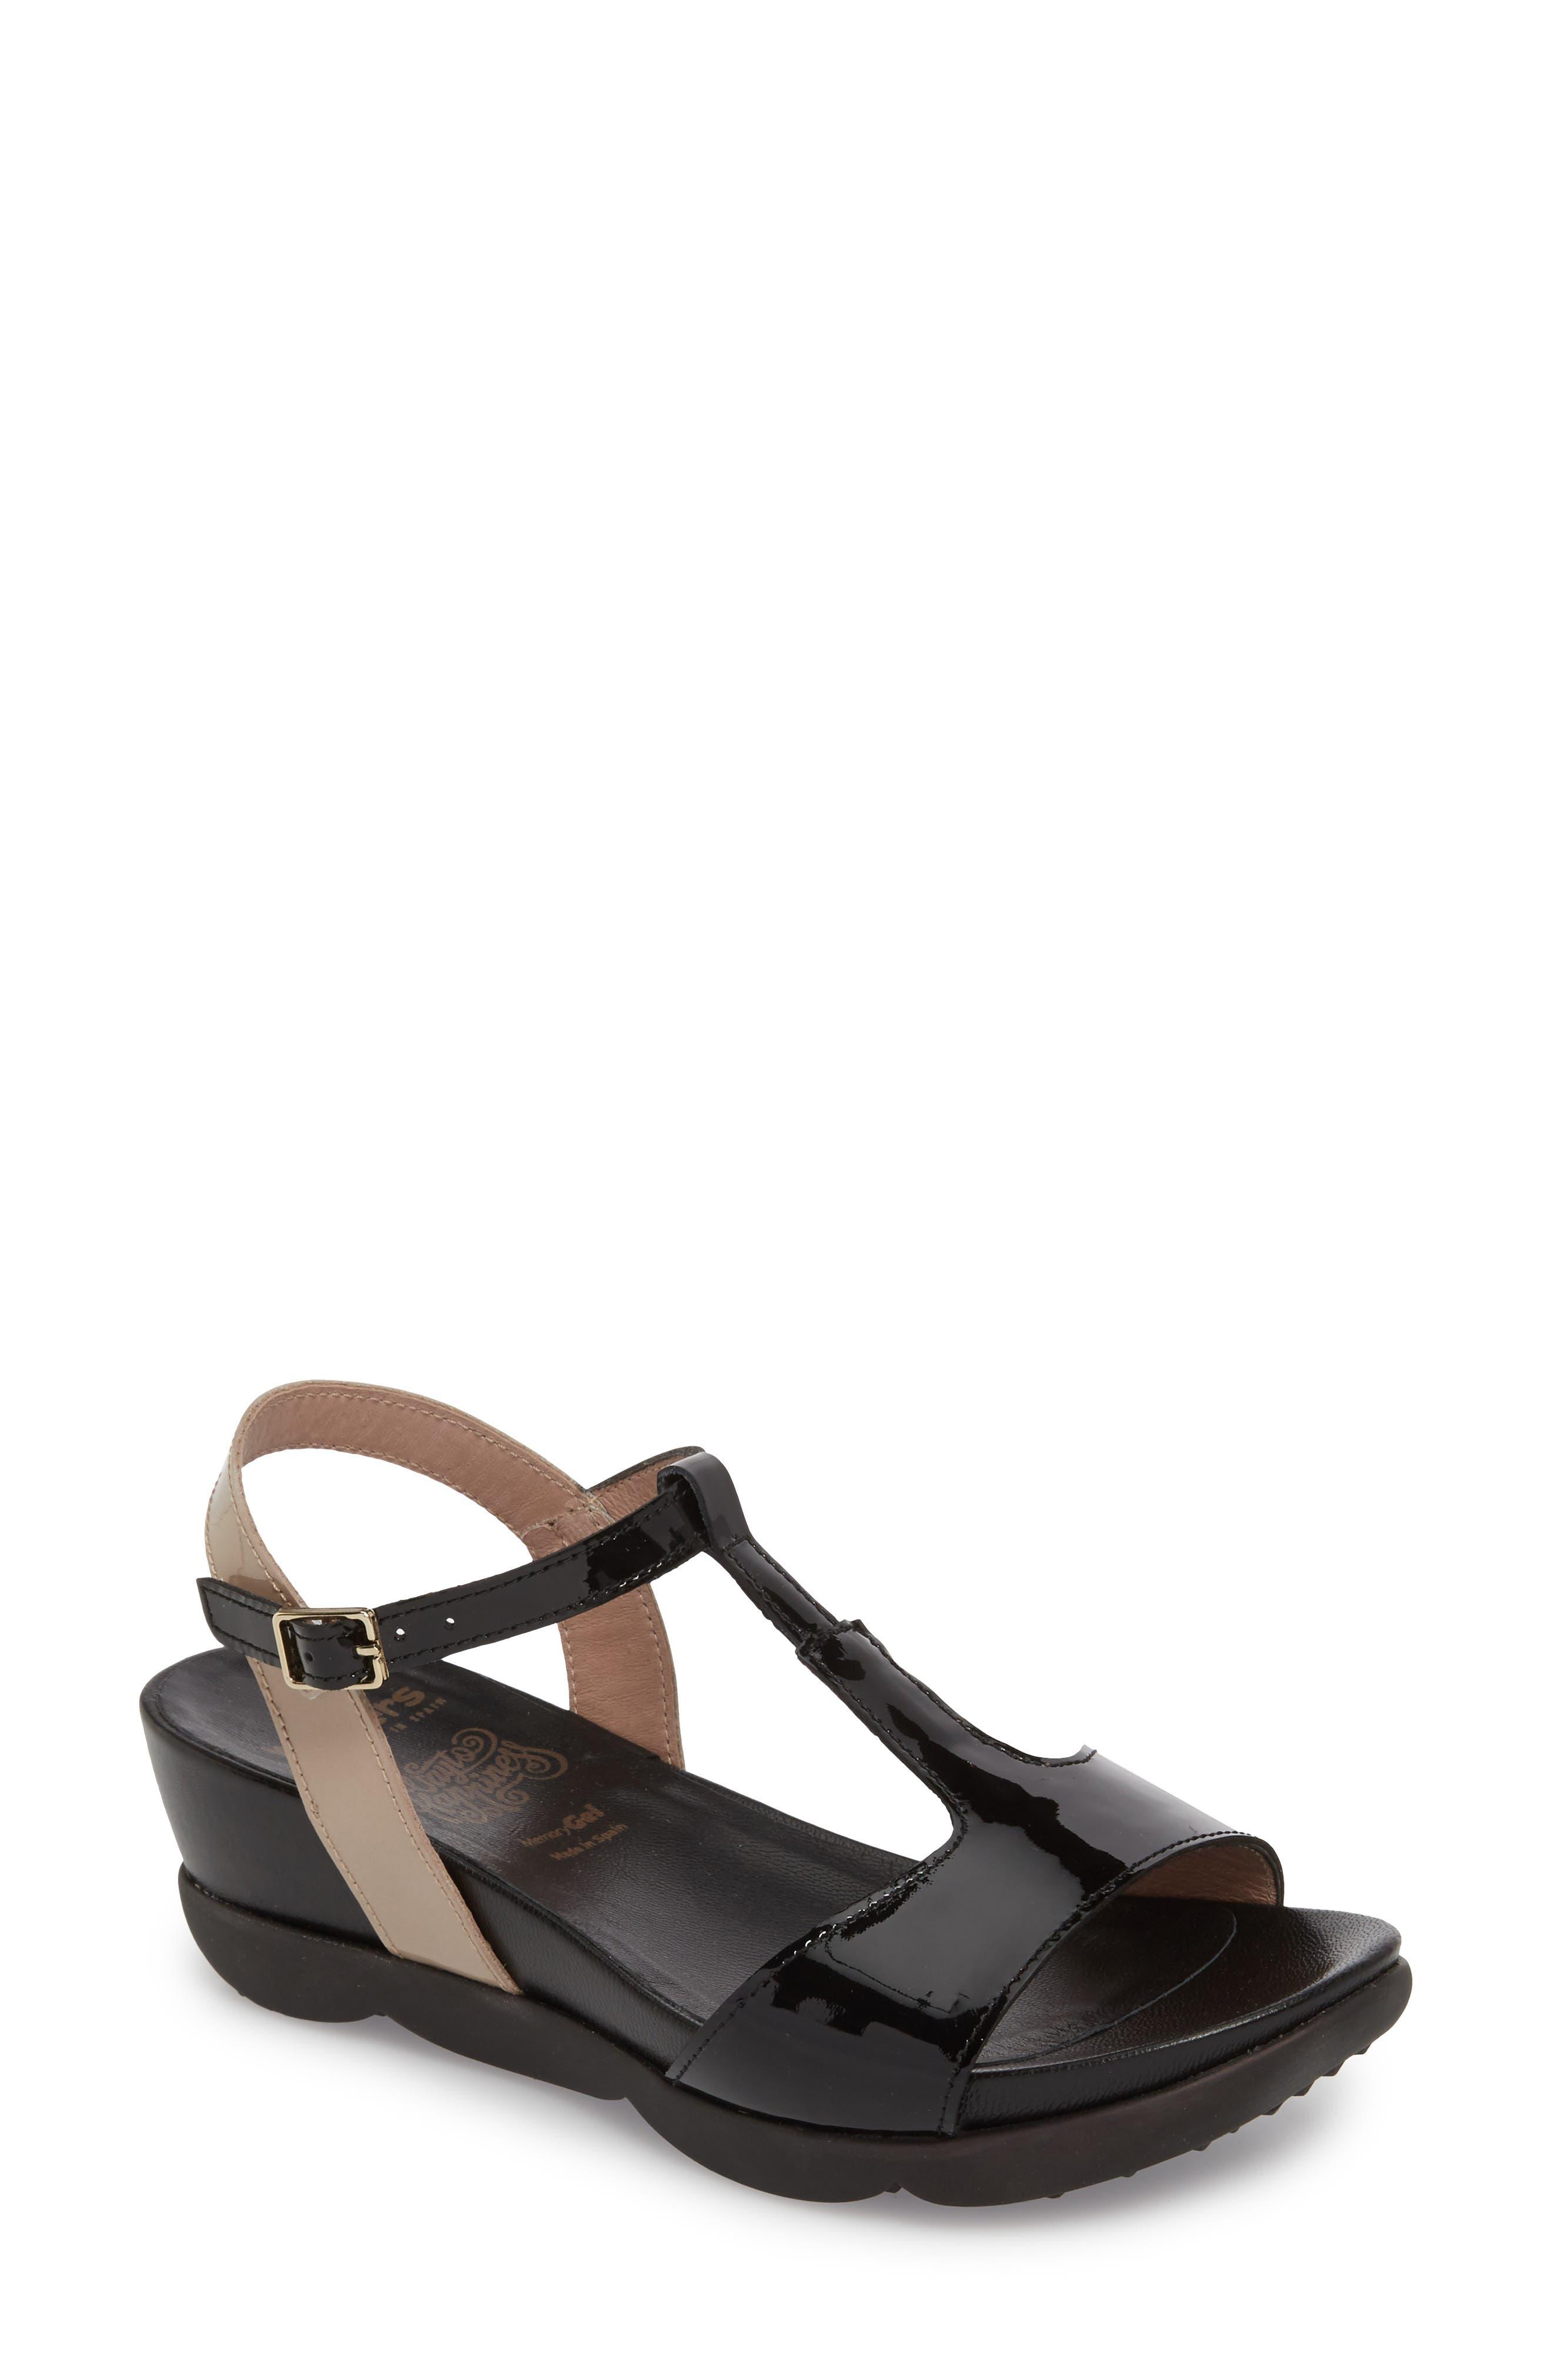 WONDERS Wedge Sandal in Black/ Taupe Leather